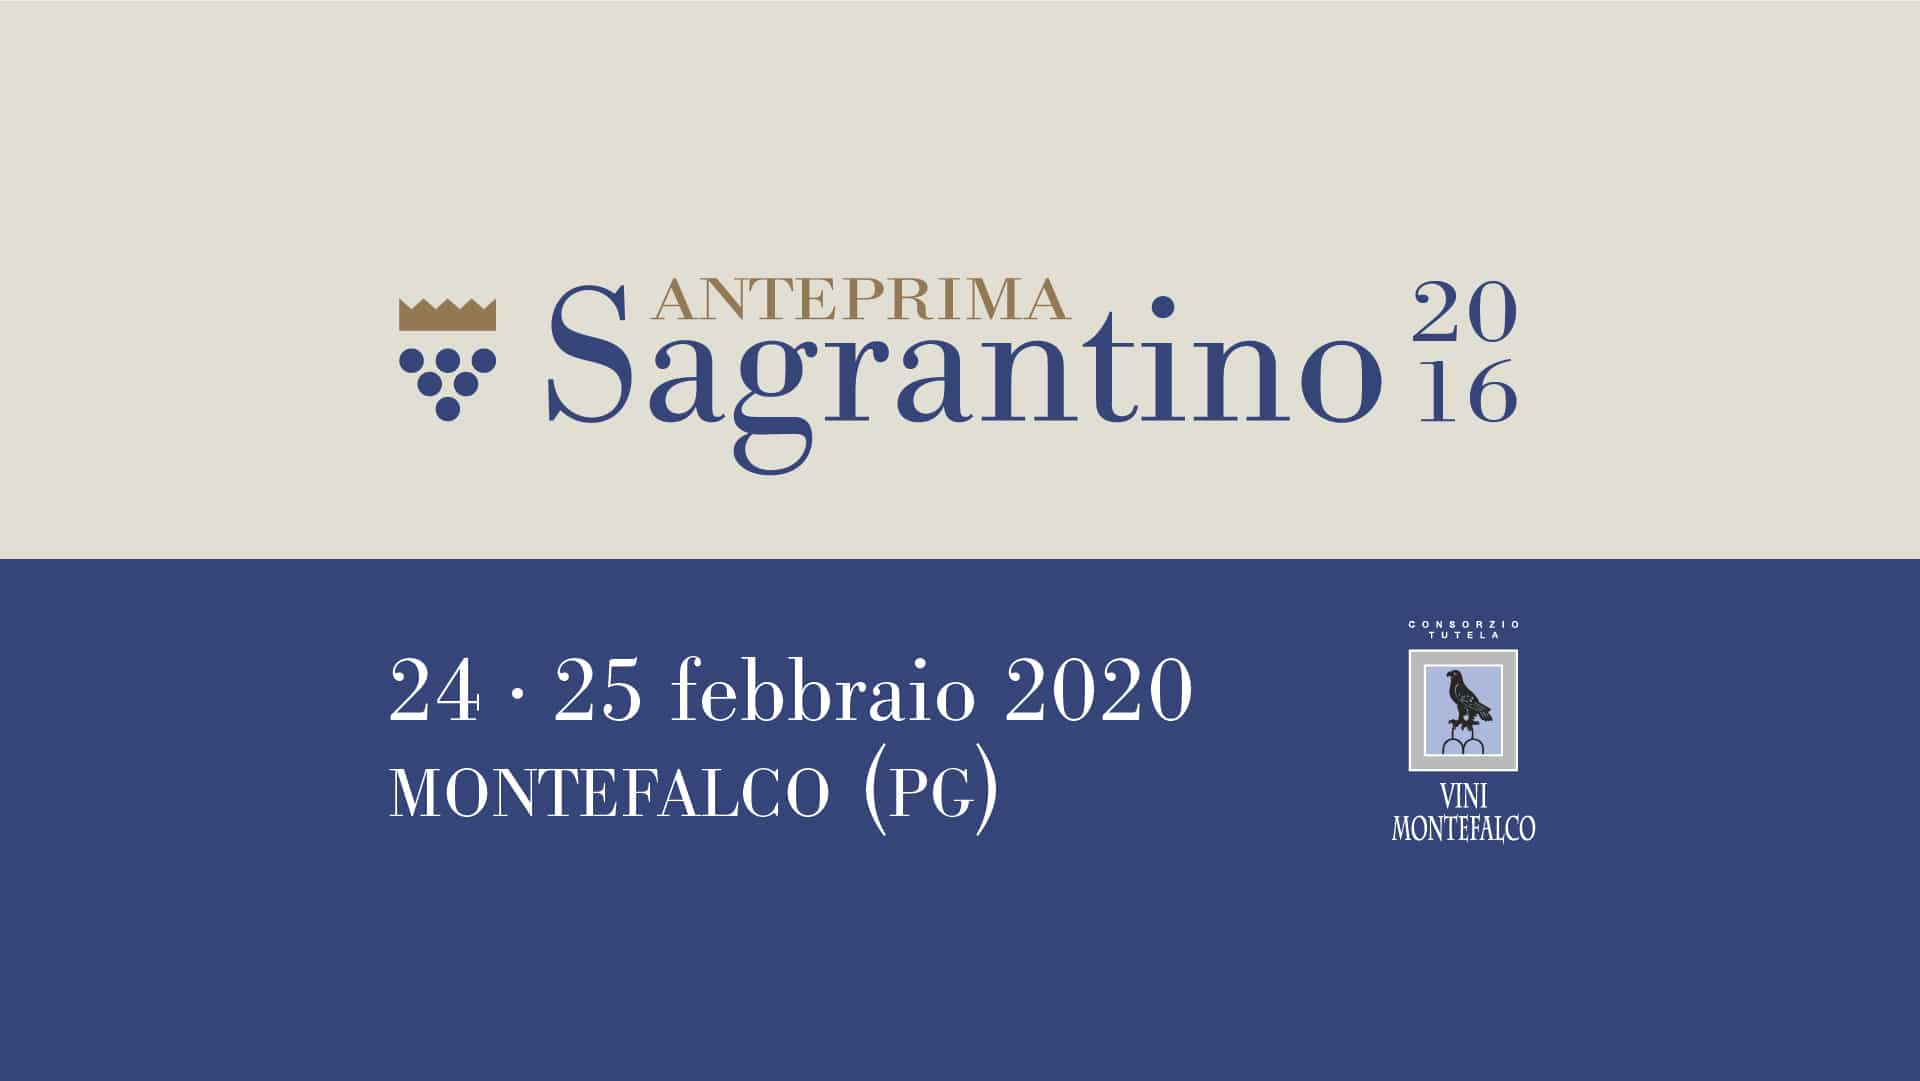 Anteprima sagrantino 2020